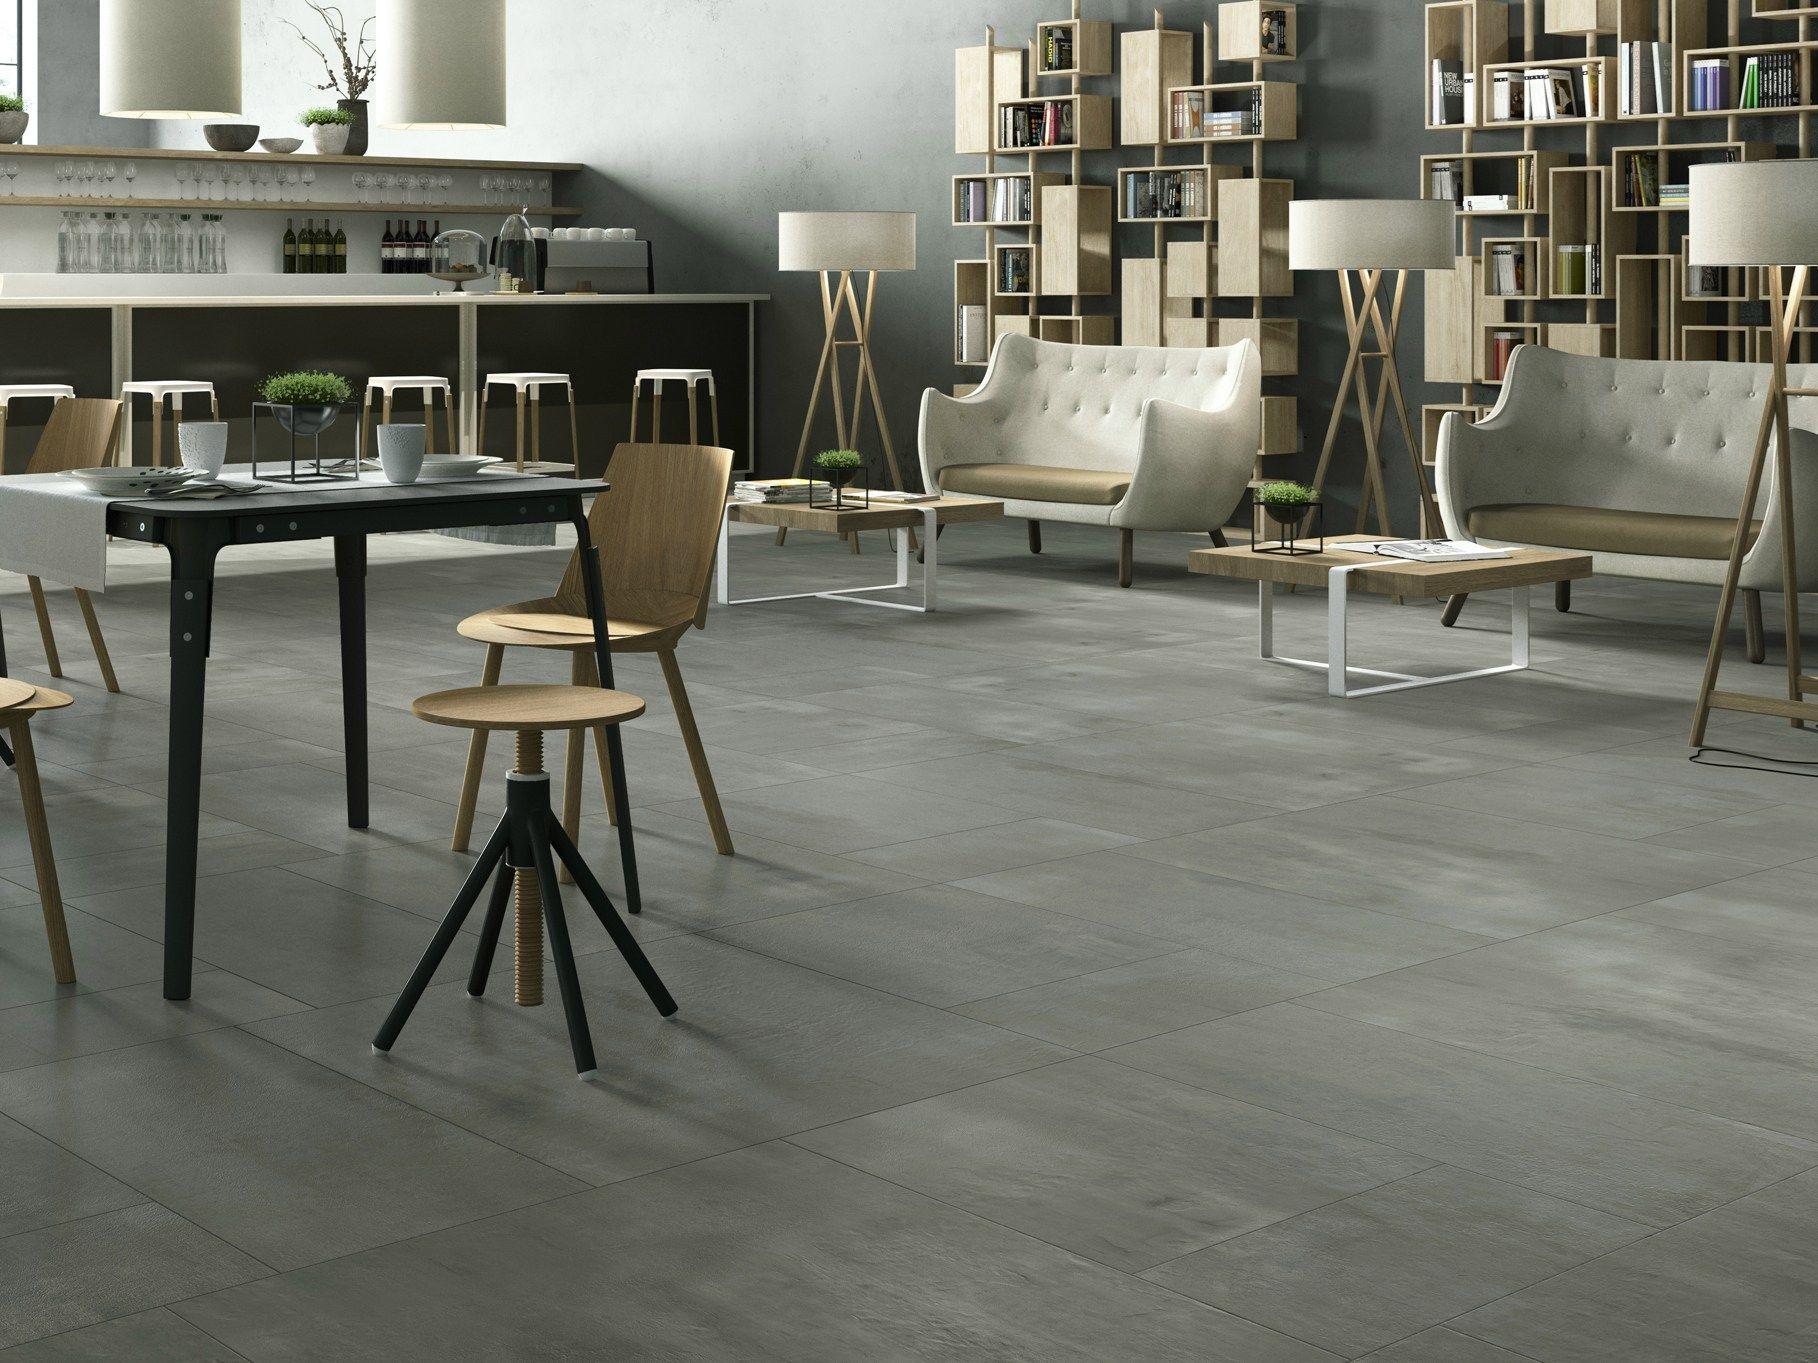 Concrete porcelain google search my futuristic home porcelain floor tiles with concrete effect creative concrete tile collection dailygadgetfo Image collections